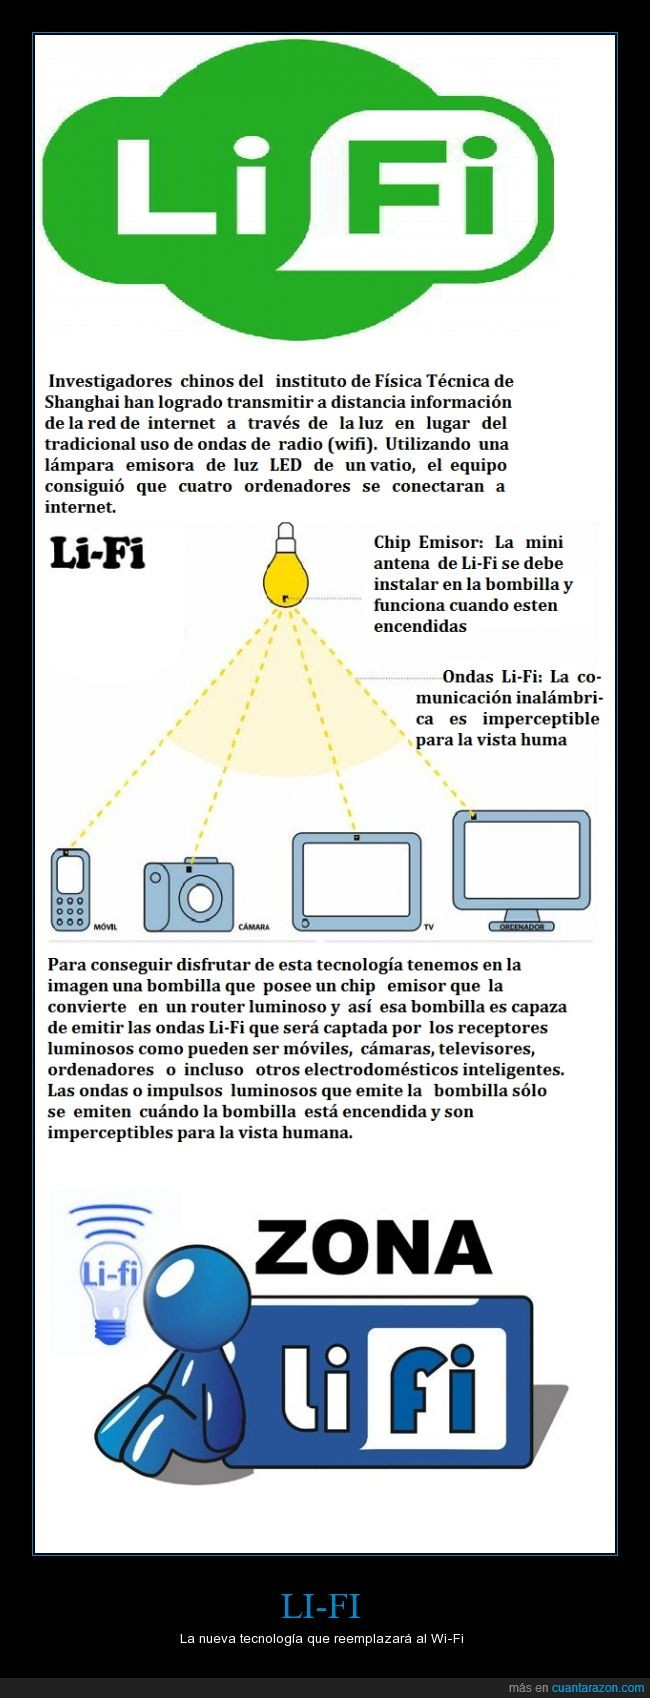 desde el 2011,internet,li fi,Li-fi,lifi,tecnología,velocidad,wi fi,Wi-Fi,wifi